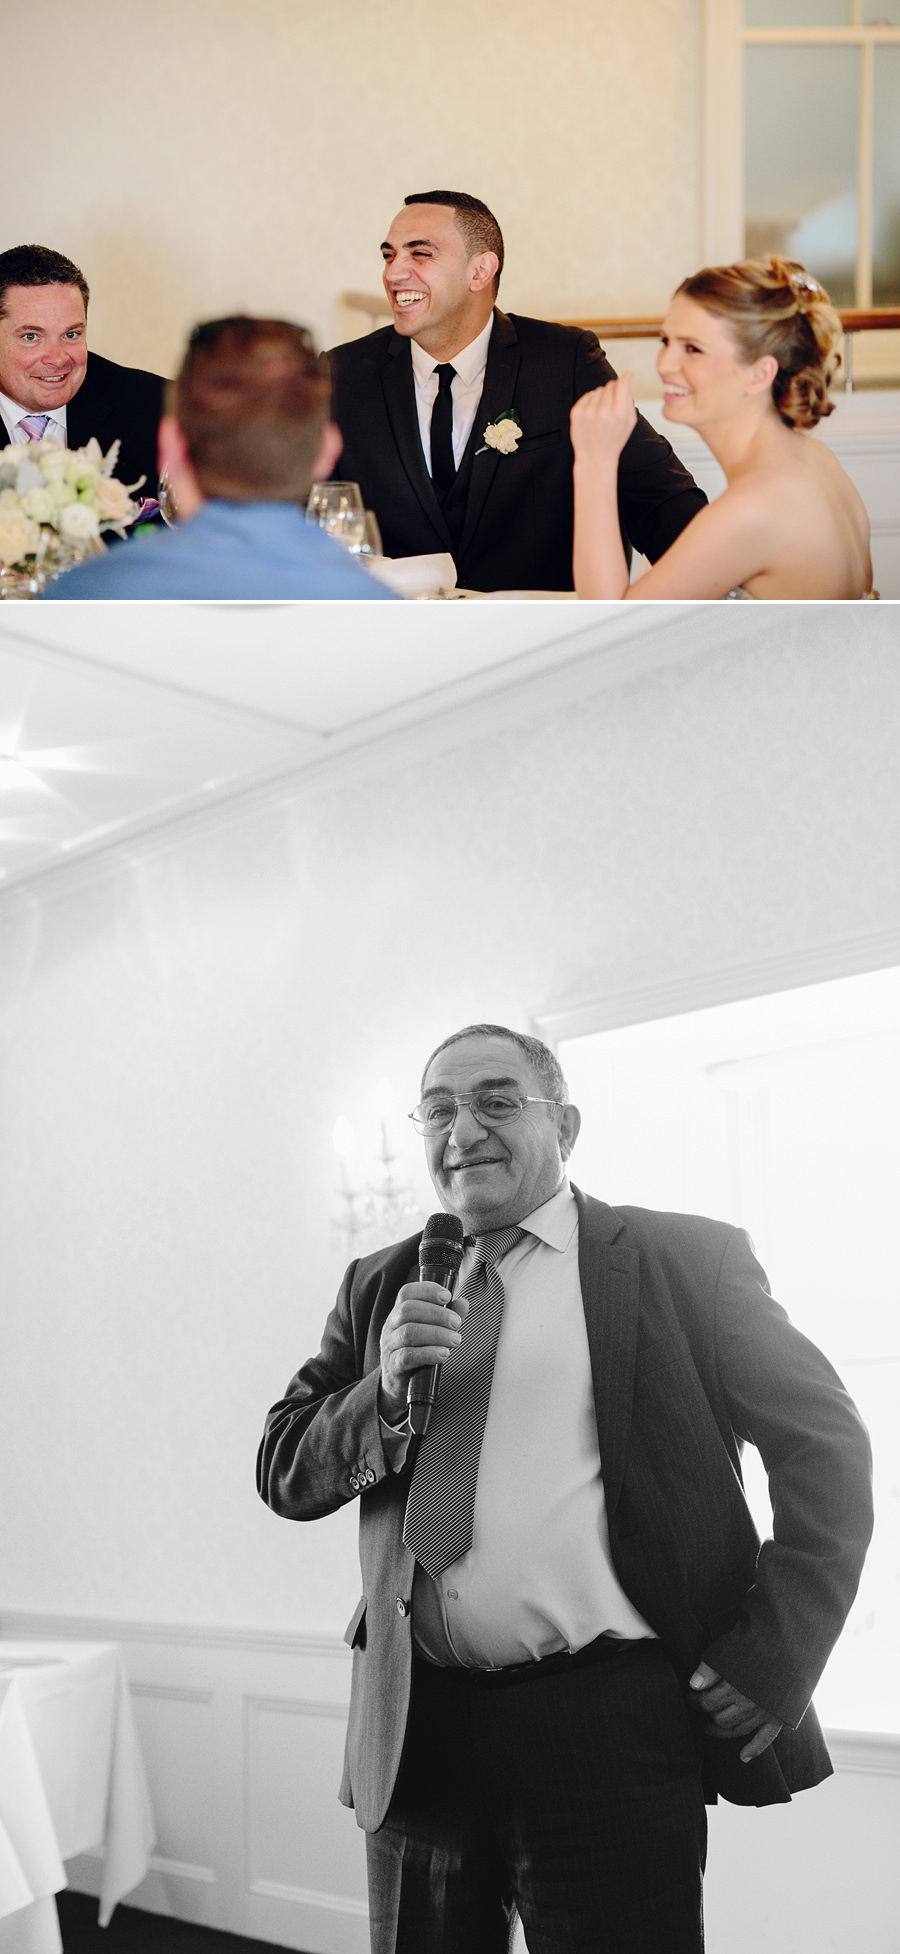 Vaucluse Wedding Photography: Reception